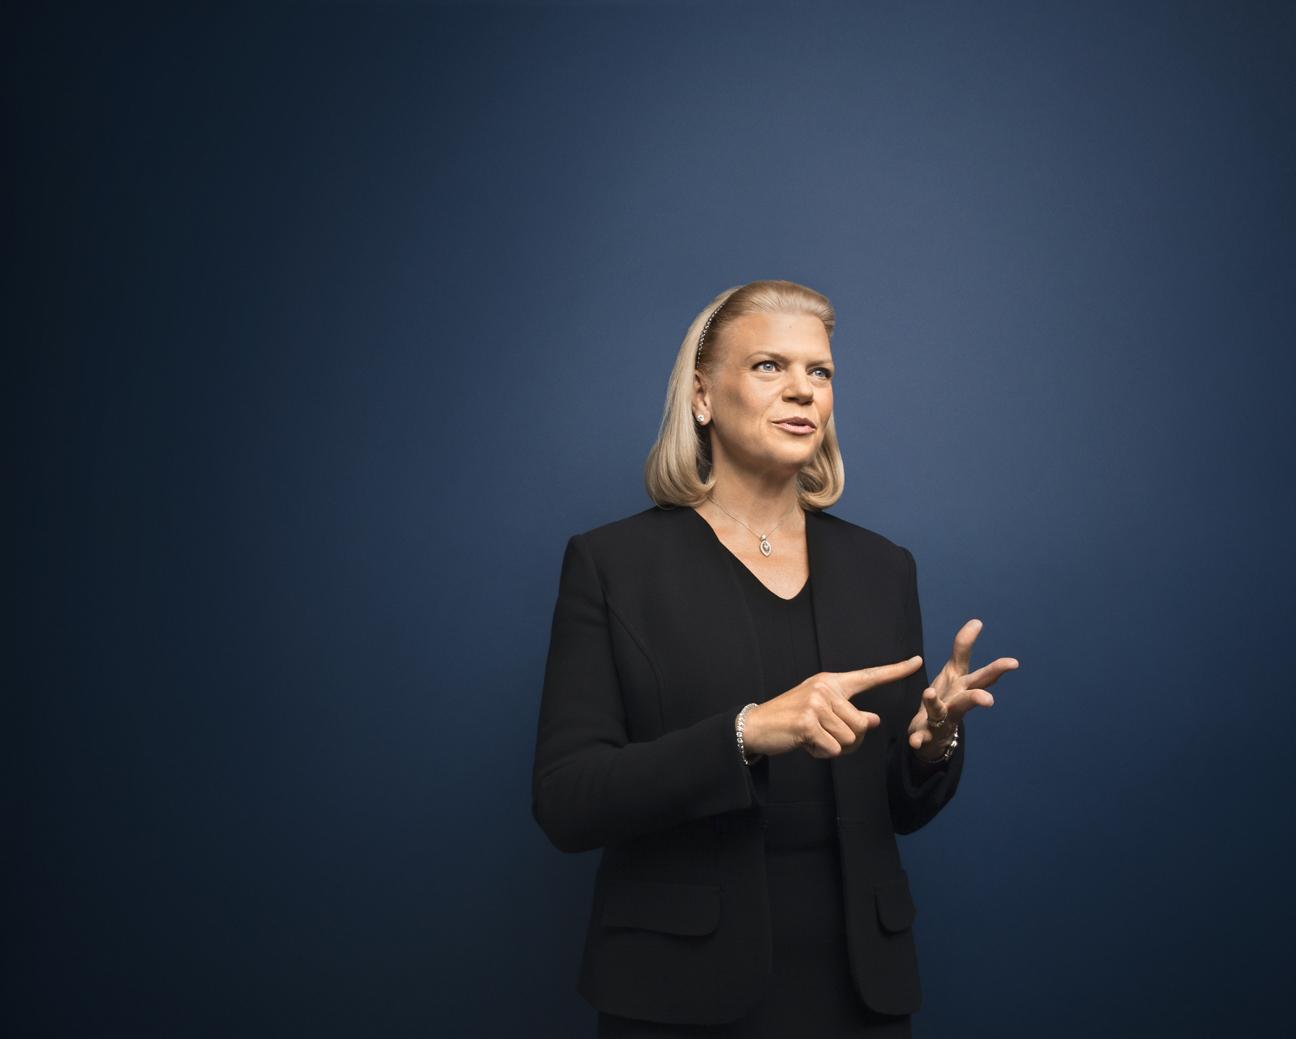 IBM CEO GINNI ROMETTY, SEPTEMBER 2014